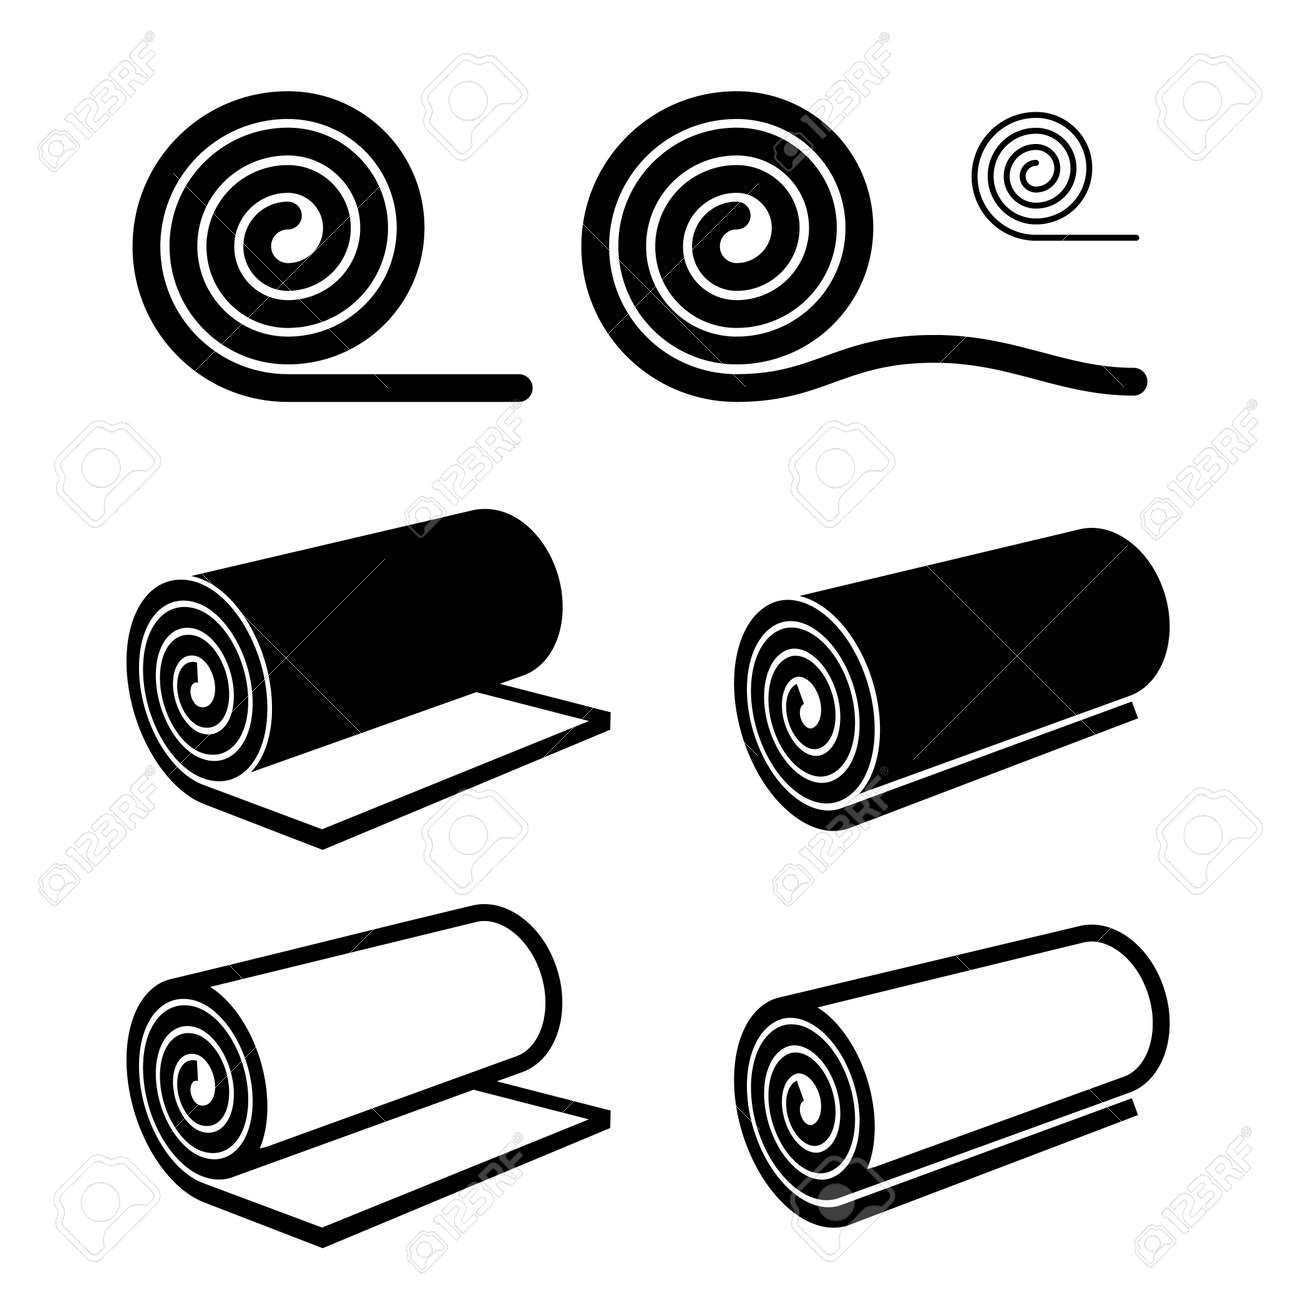 roll of anything black symbol - 59784246